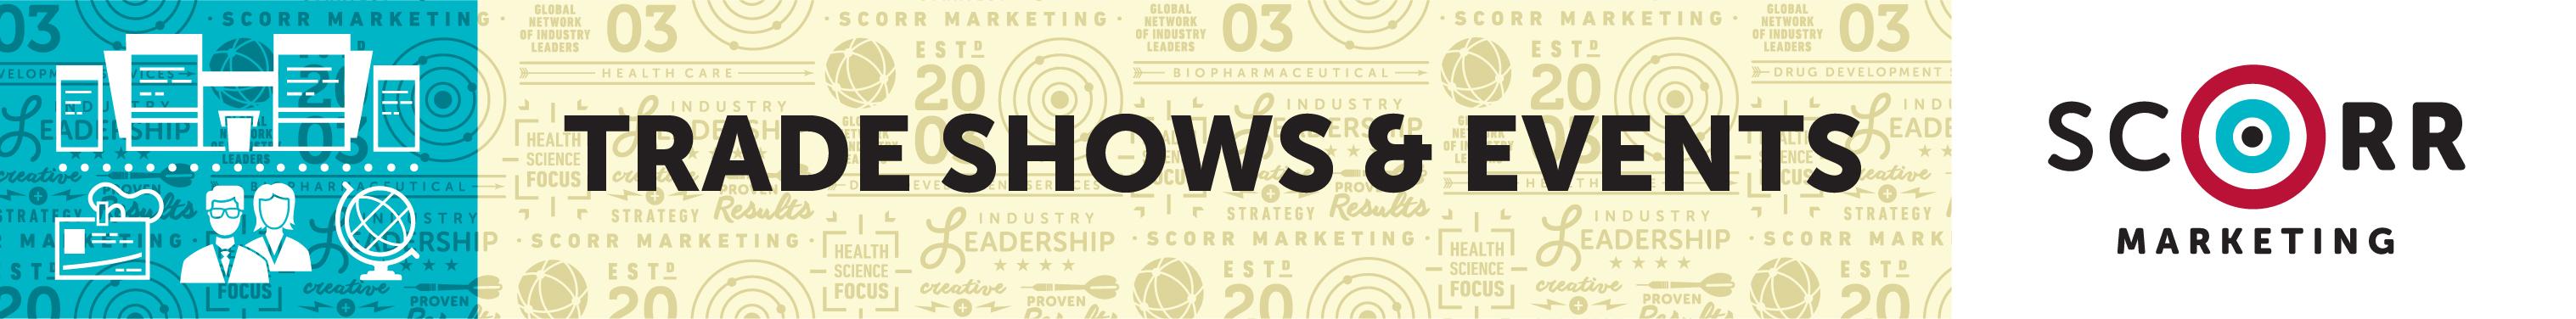 Scorr-Trade-Shows-&-Events